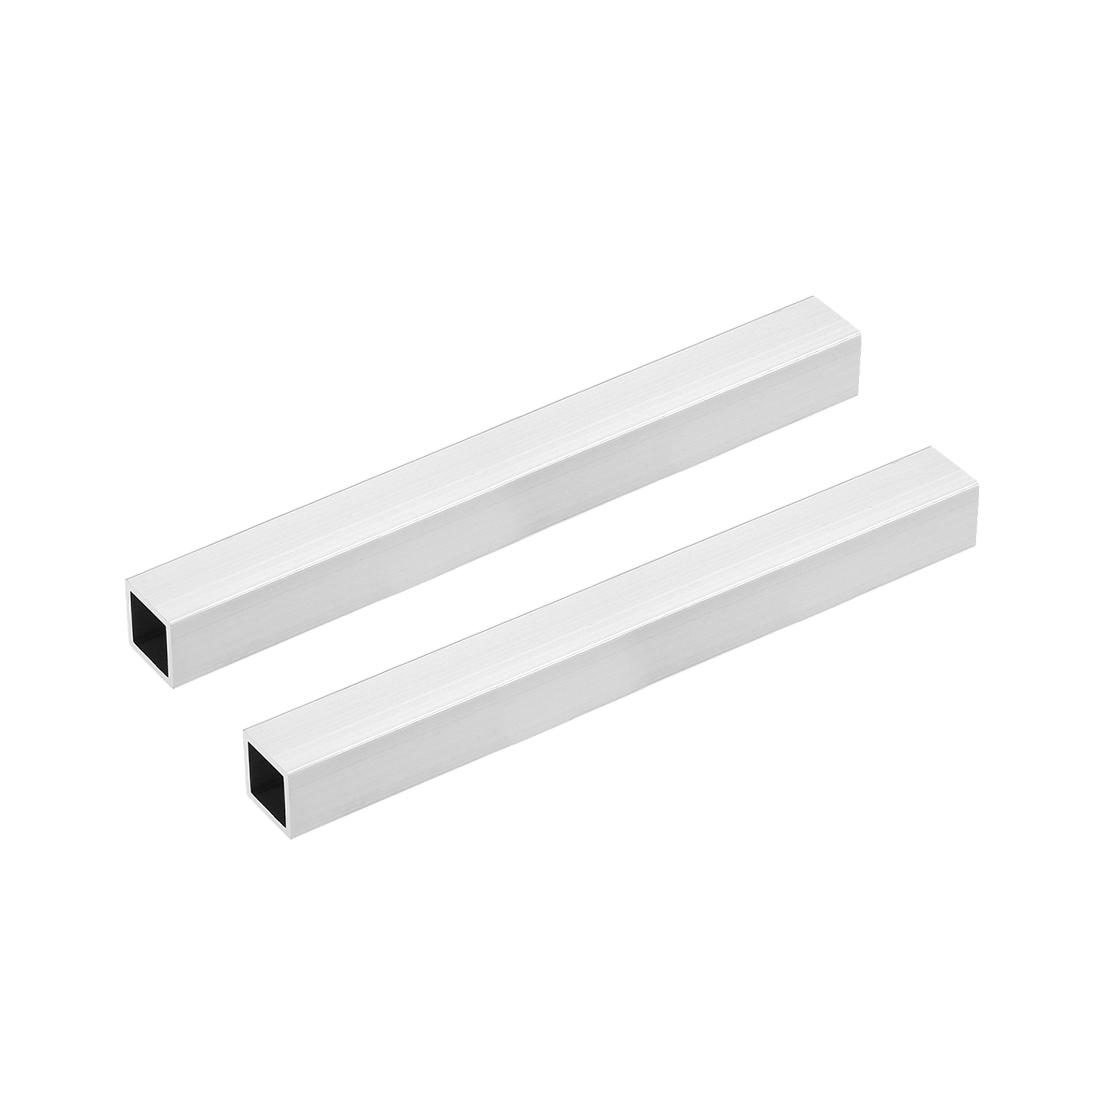 6063 Aluminum Square Tube 20mmx20mmx1.2mm Wall Thickness 200mm Long Tubing 2 Pcs